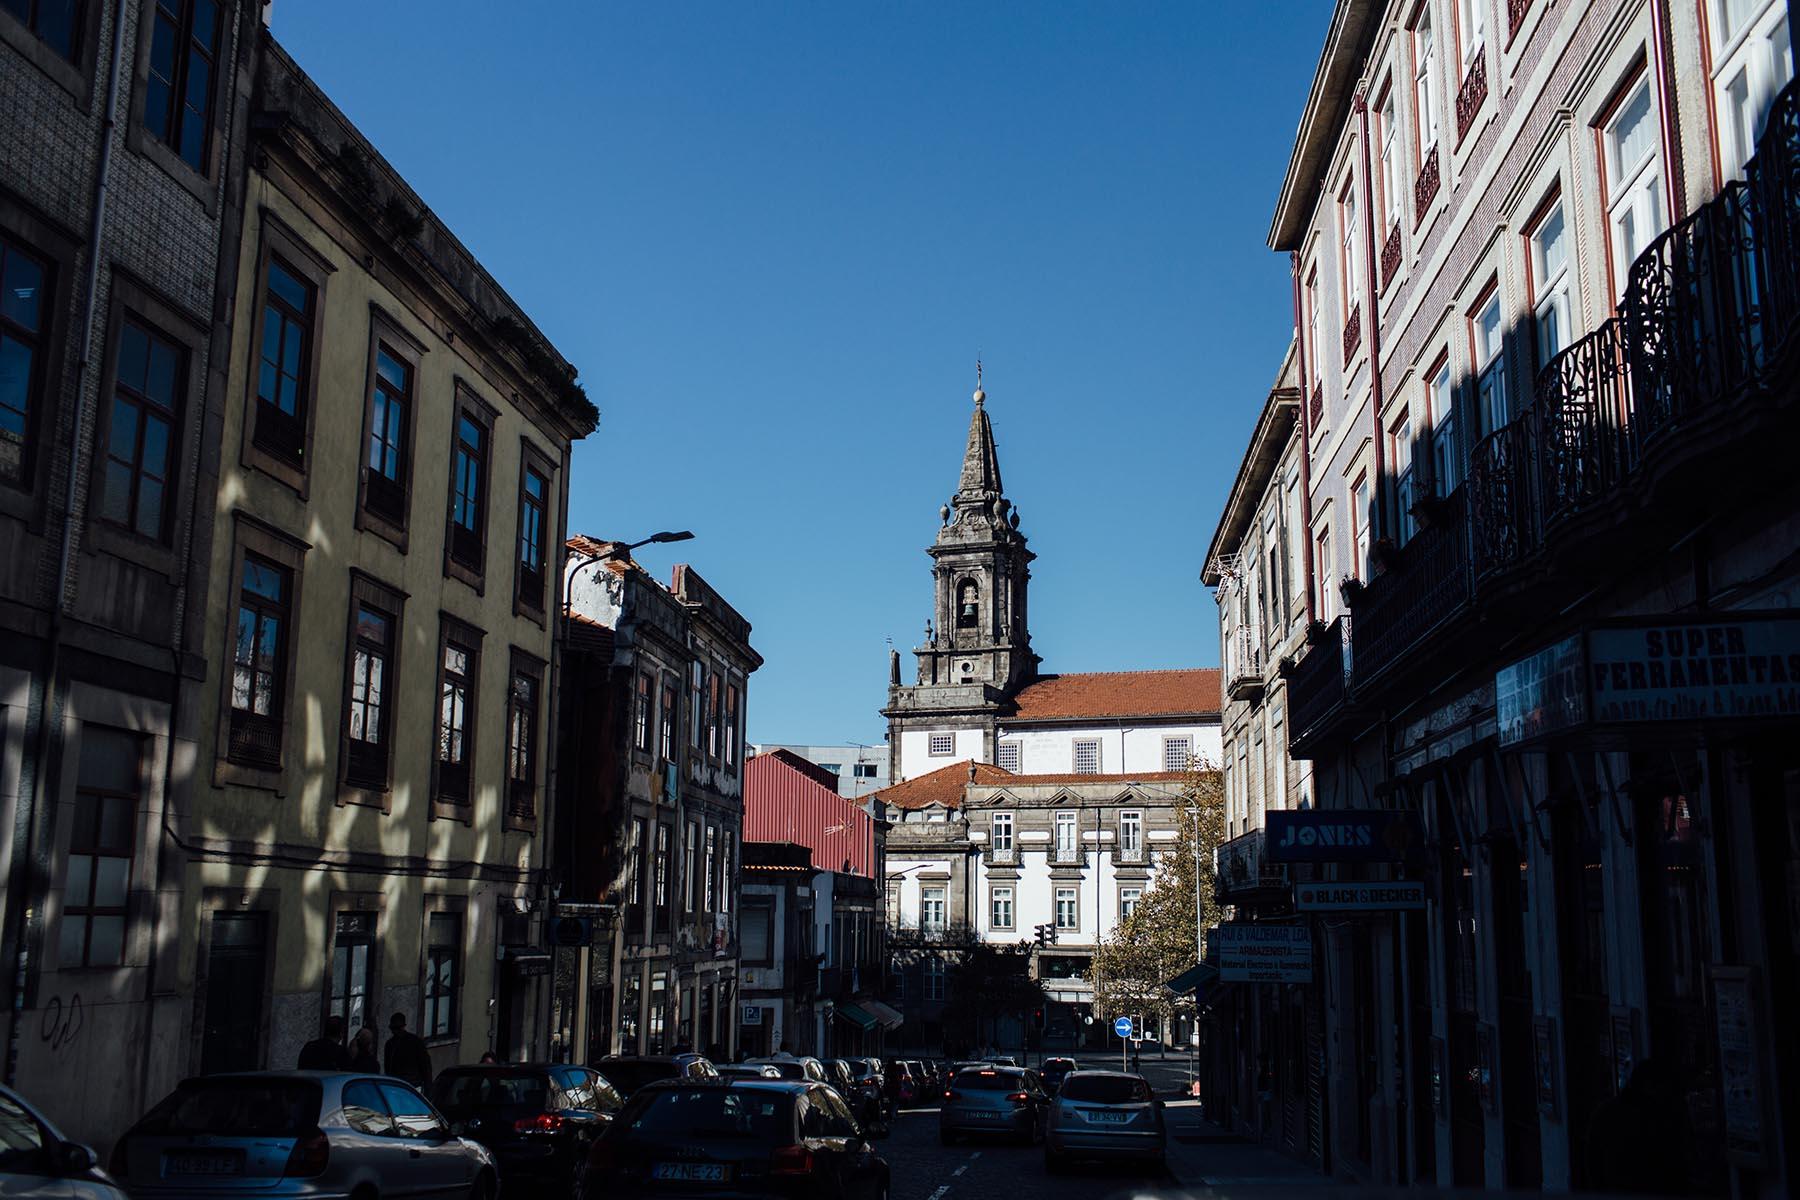 porto_nov17_streets_04.jpg